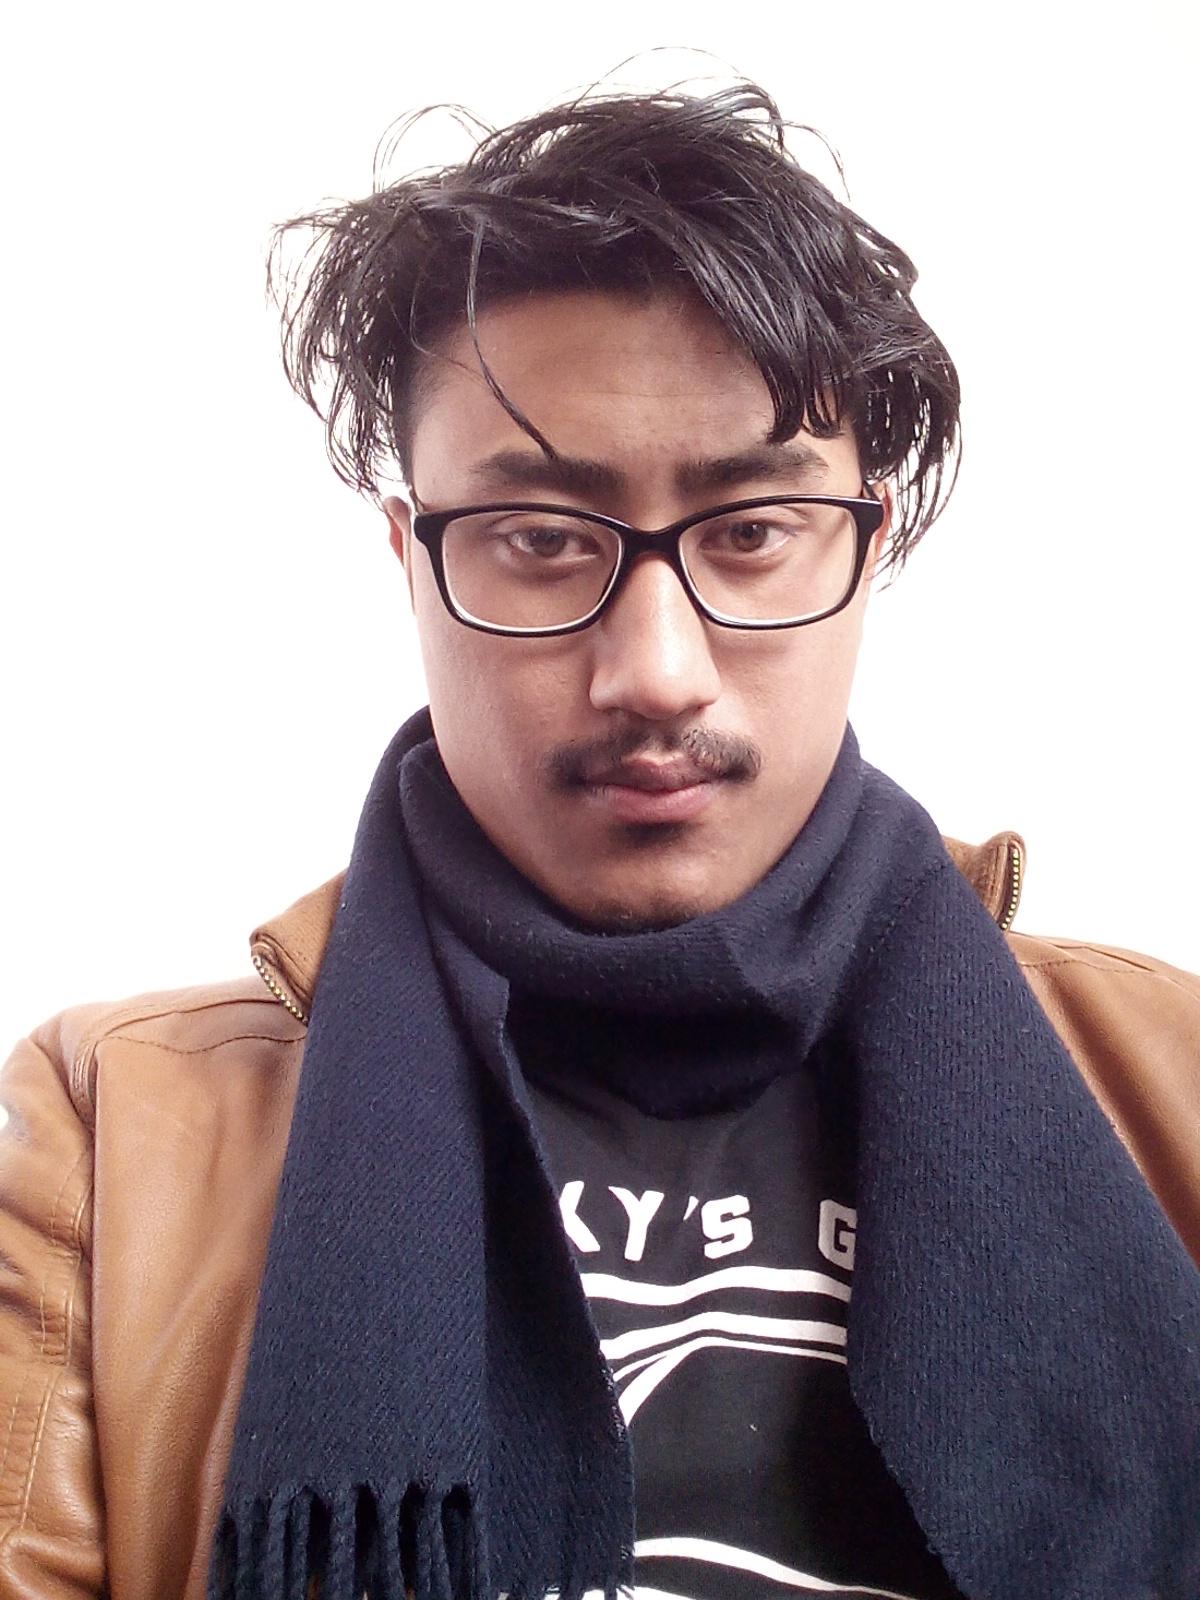 Umidigi G gadgetbyte nepal Sample